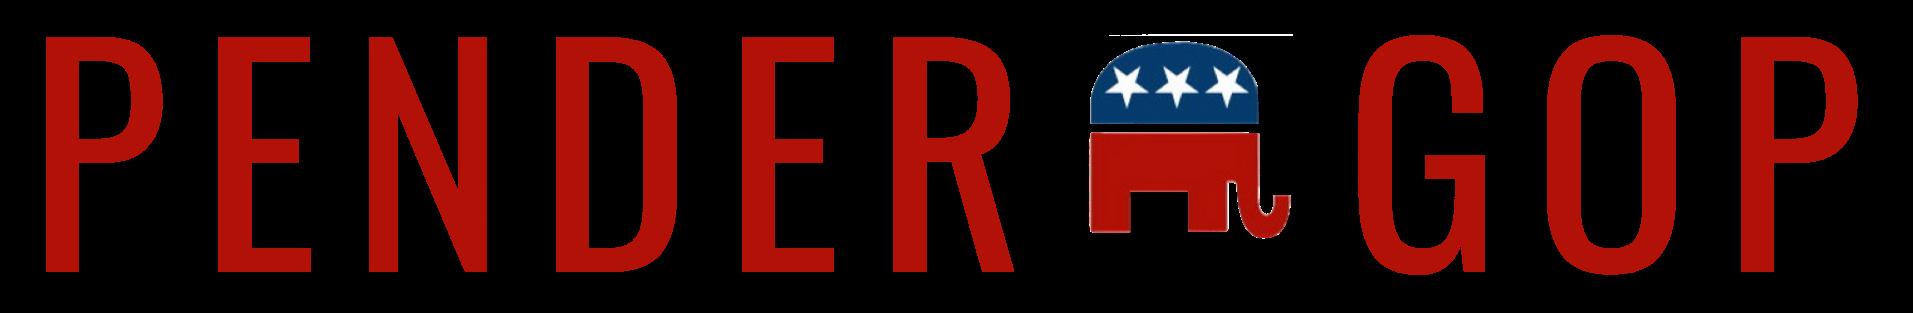 Pender County Republican Party